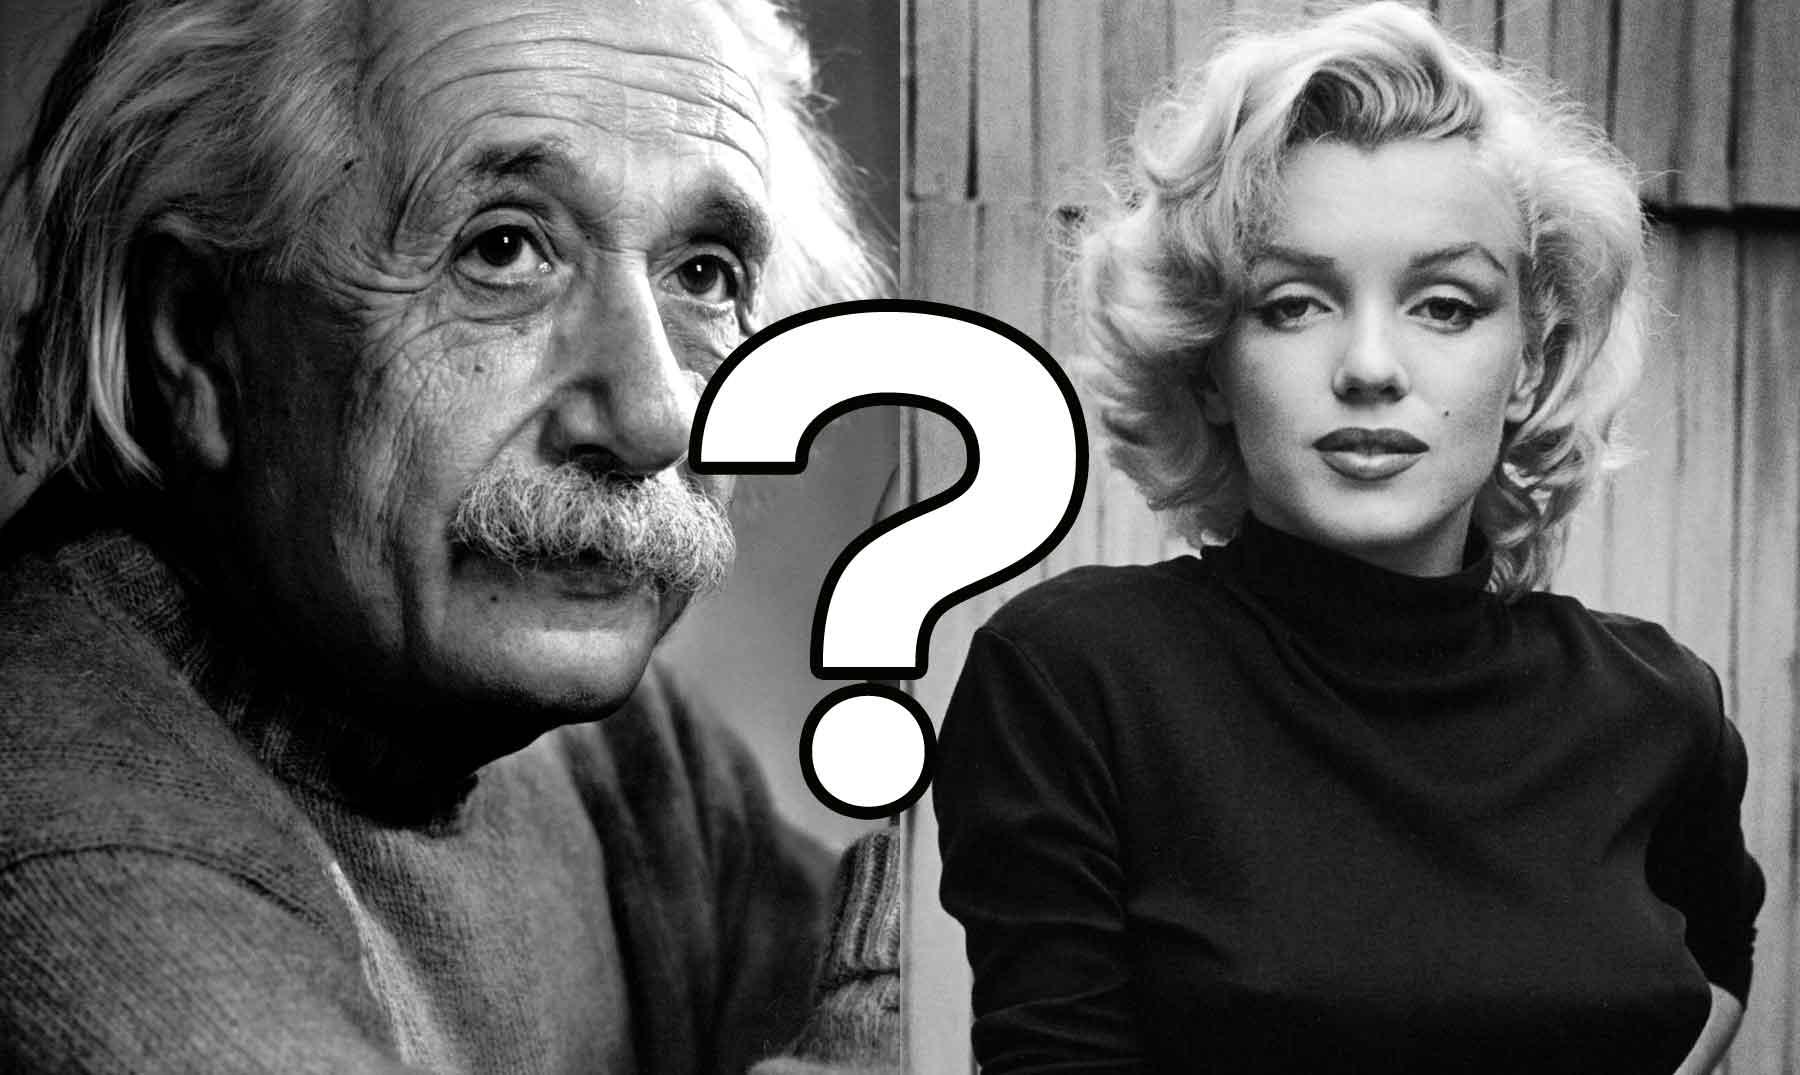 ¿Qué le propuso Marilyn Monroe a Albert Einstein